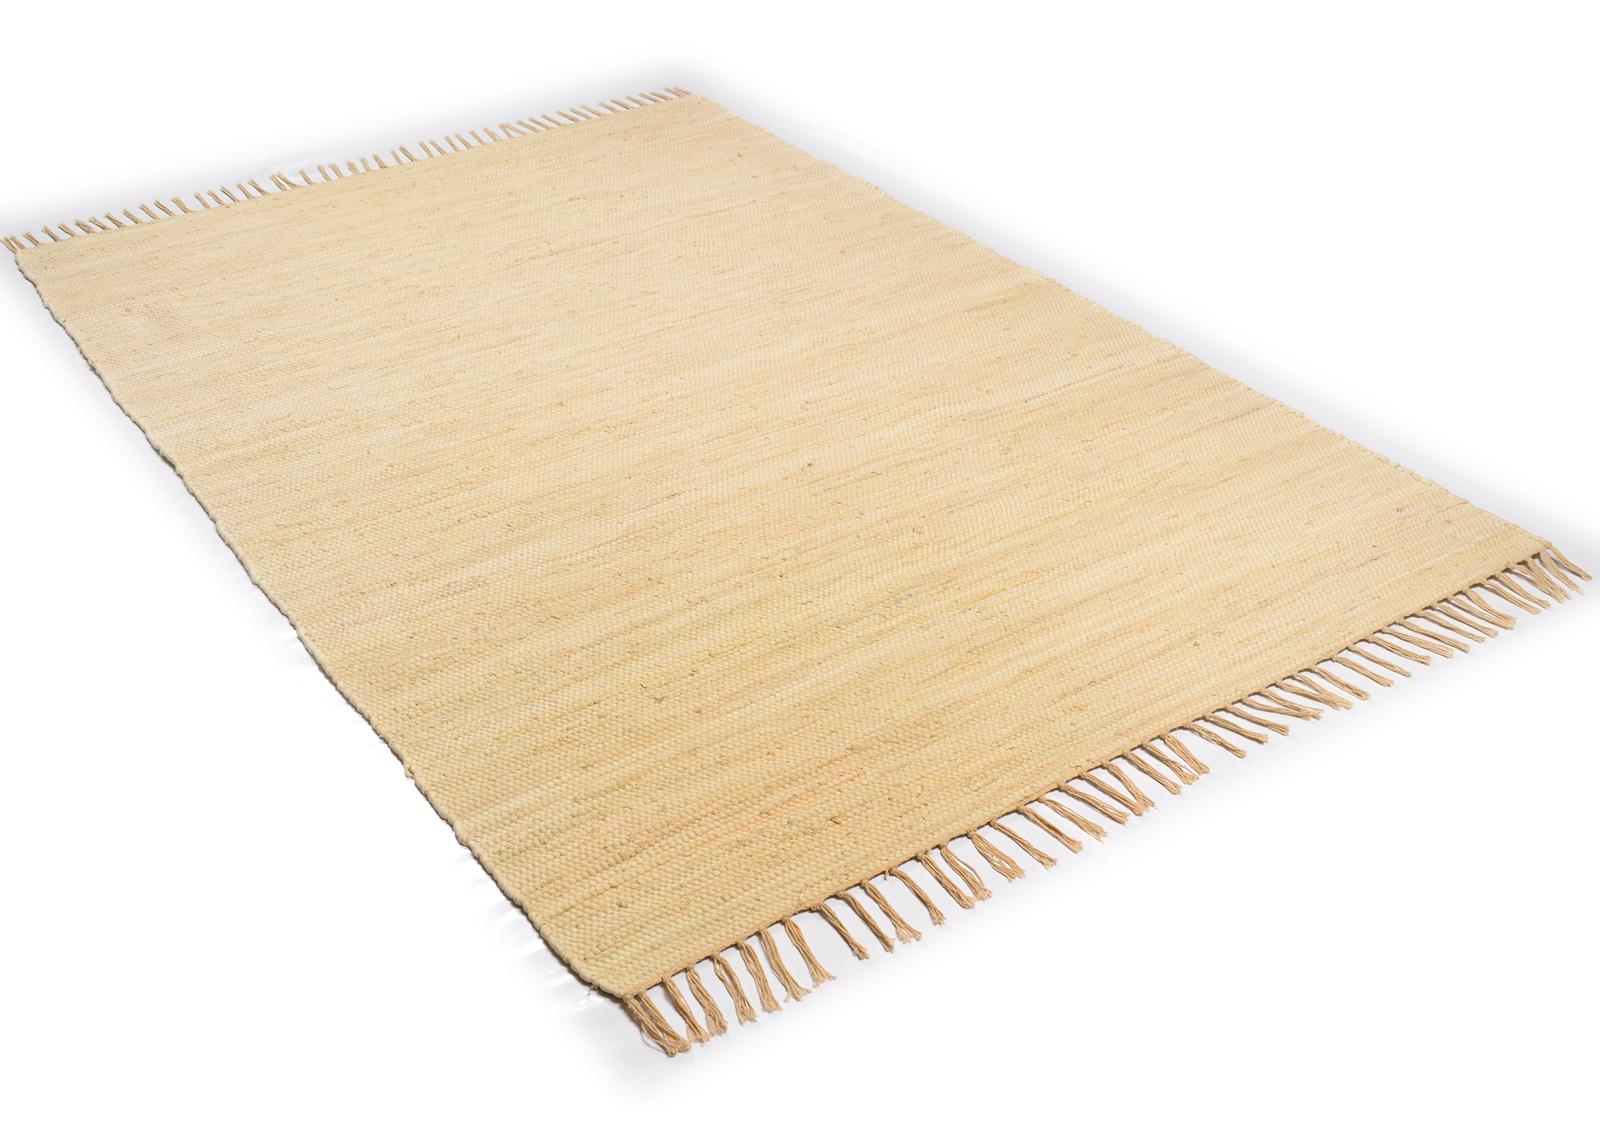 Matto Happy Cotton 90x160 cm, luonnonvalkoinen